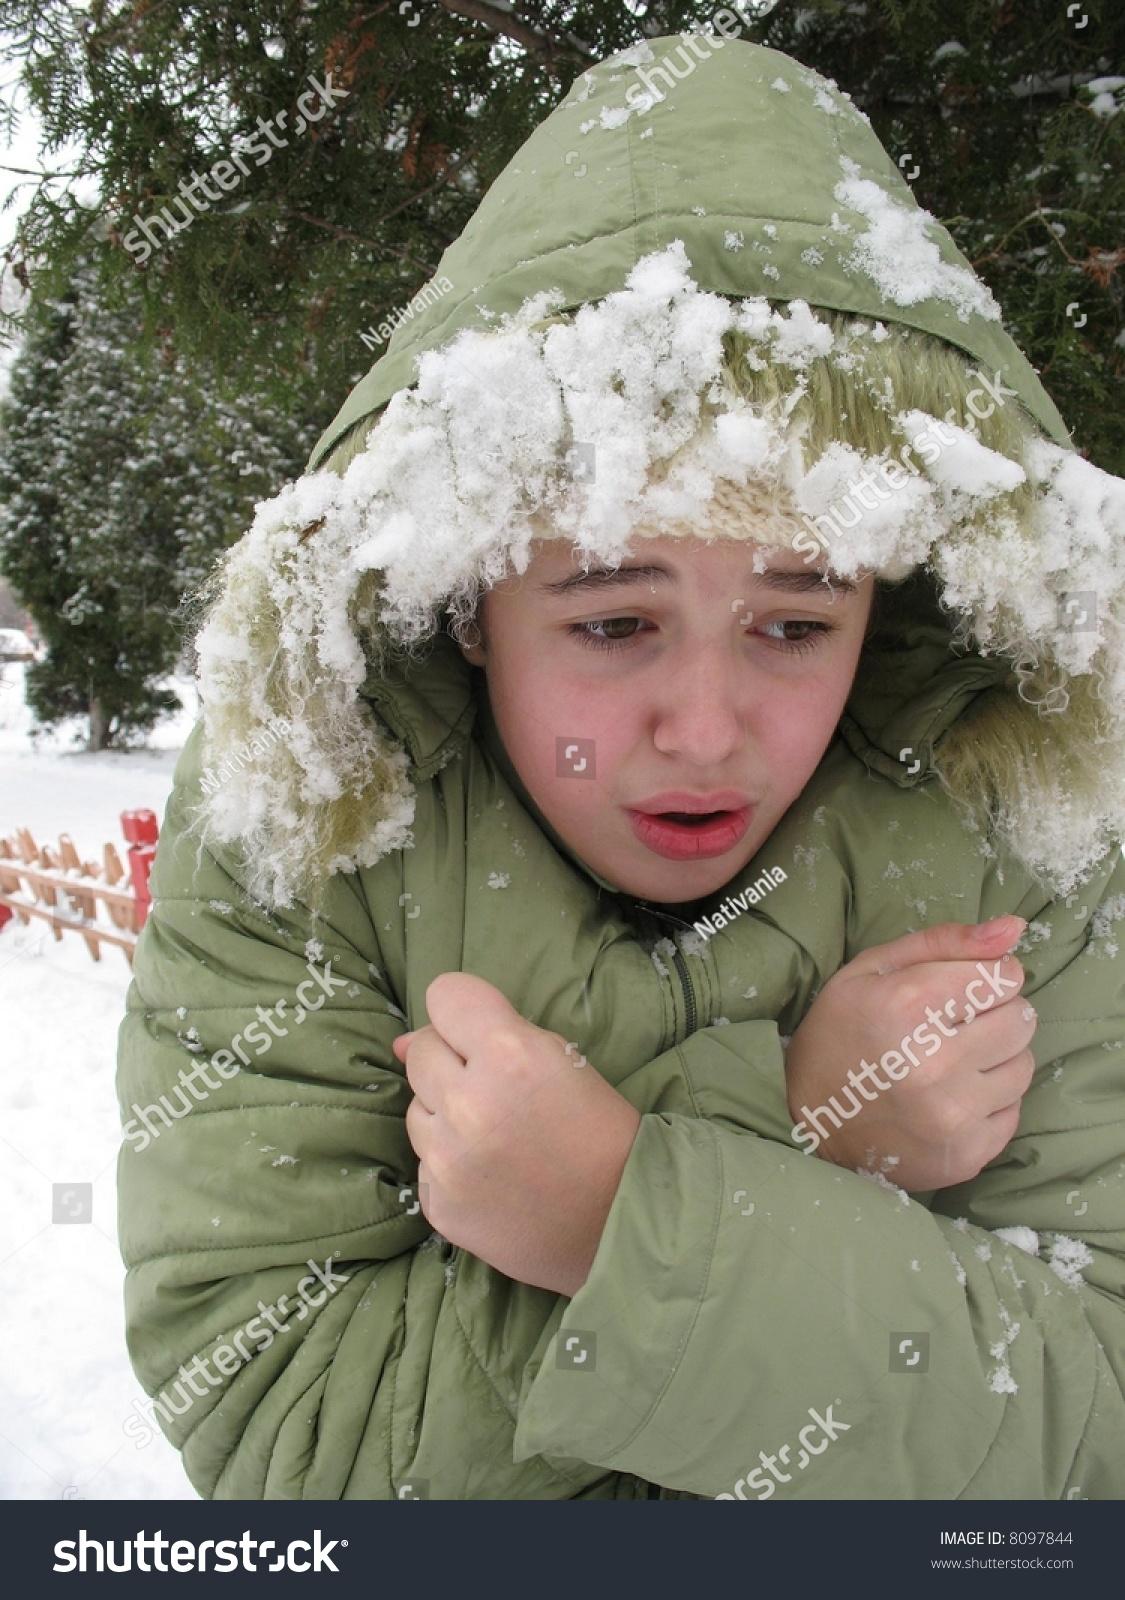 The Freezing Girl Stock Photo 8097844 : Shutterstock